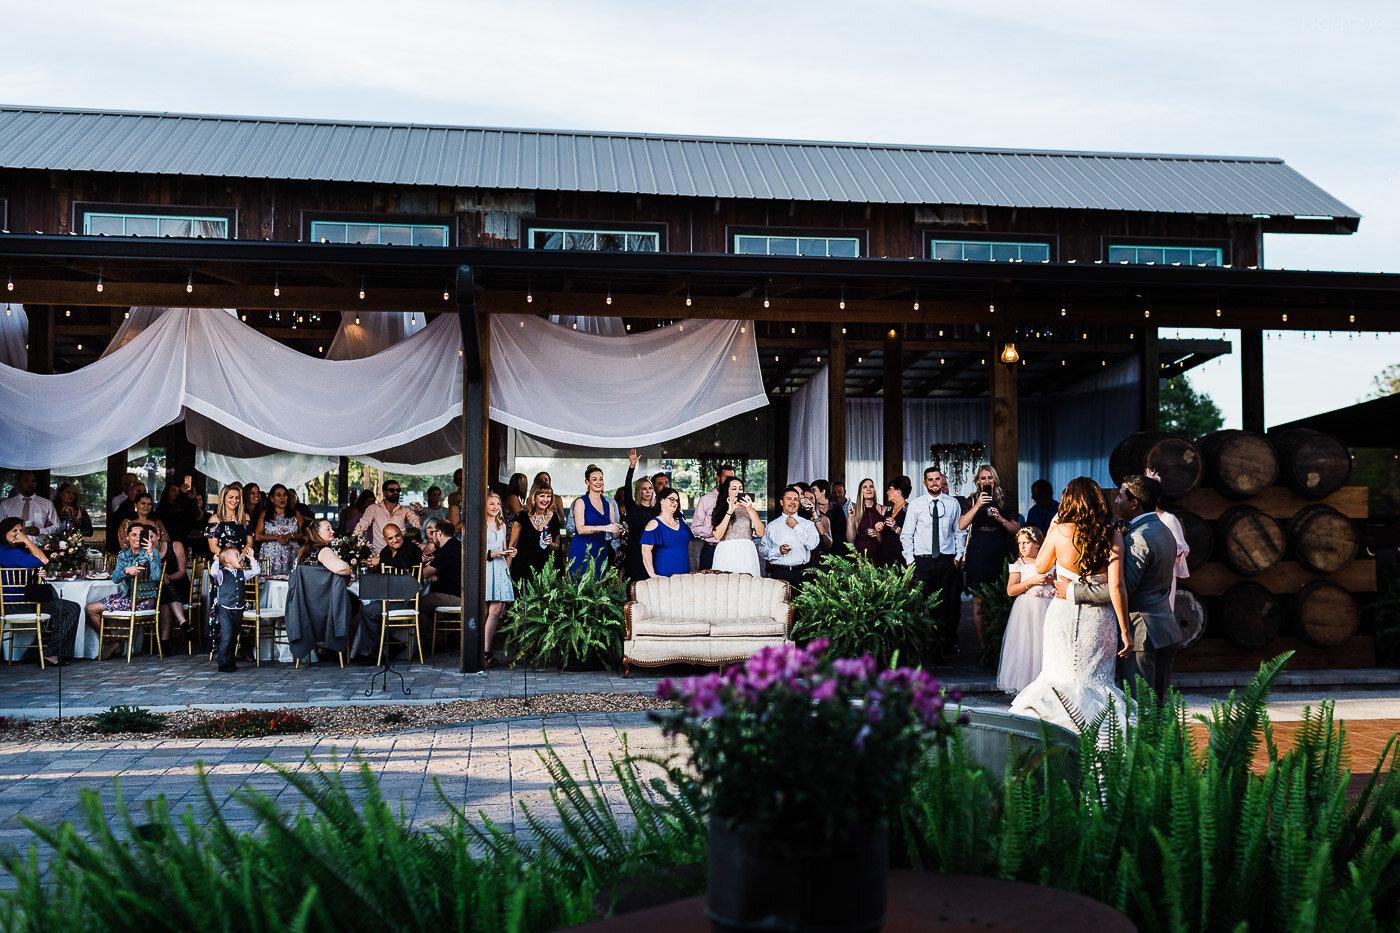 Lakeland-barn-wedding-at-white-horse-ranch-79.jpg